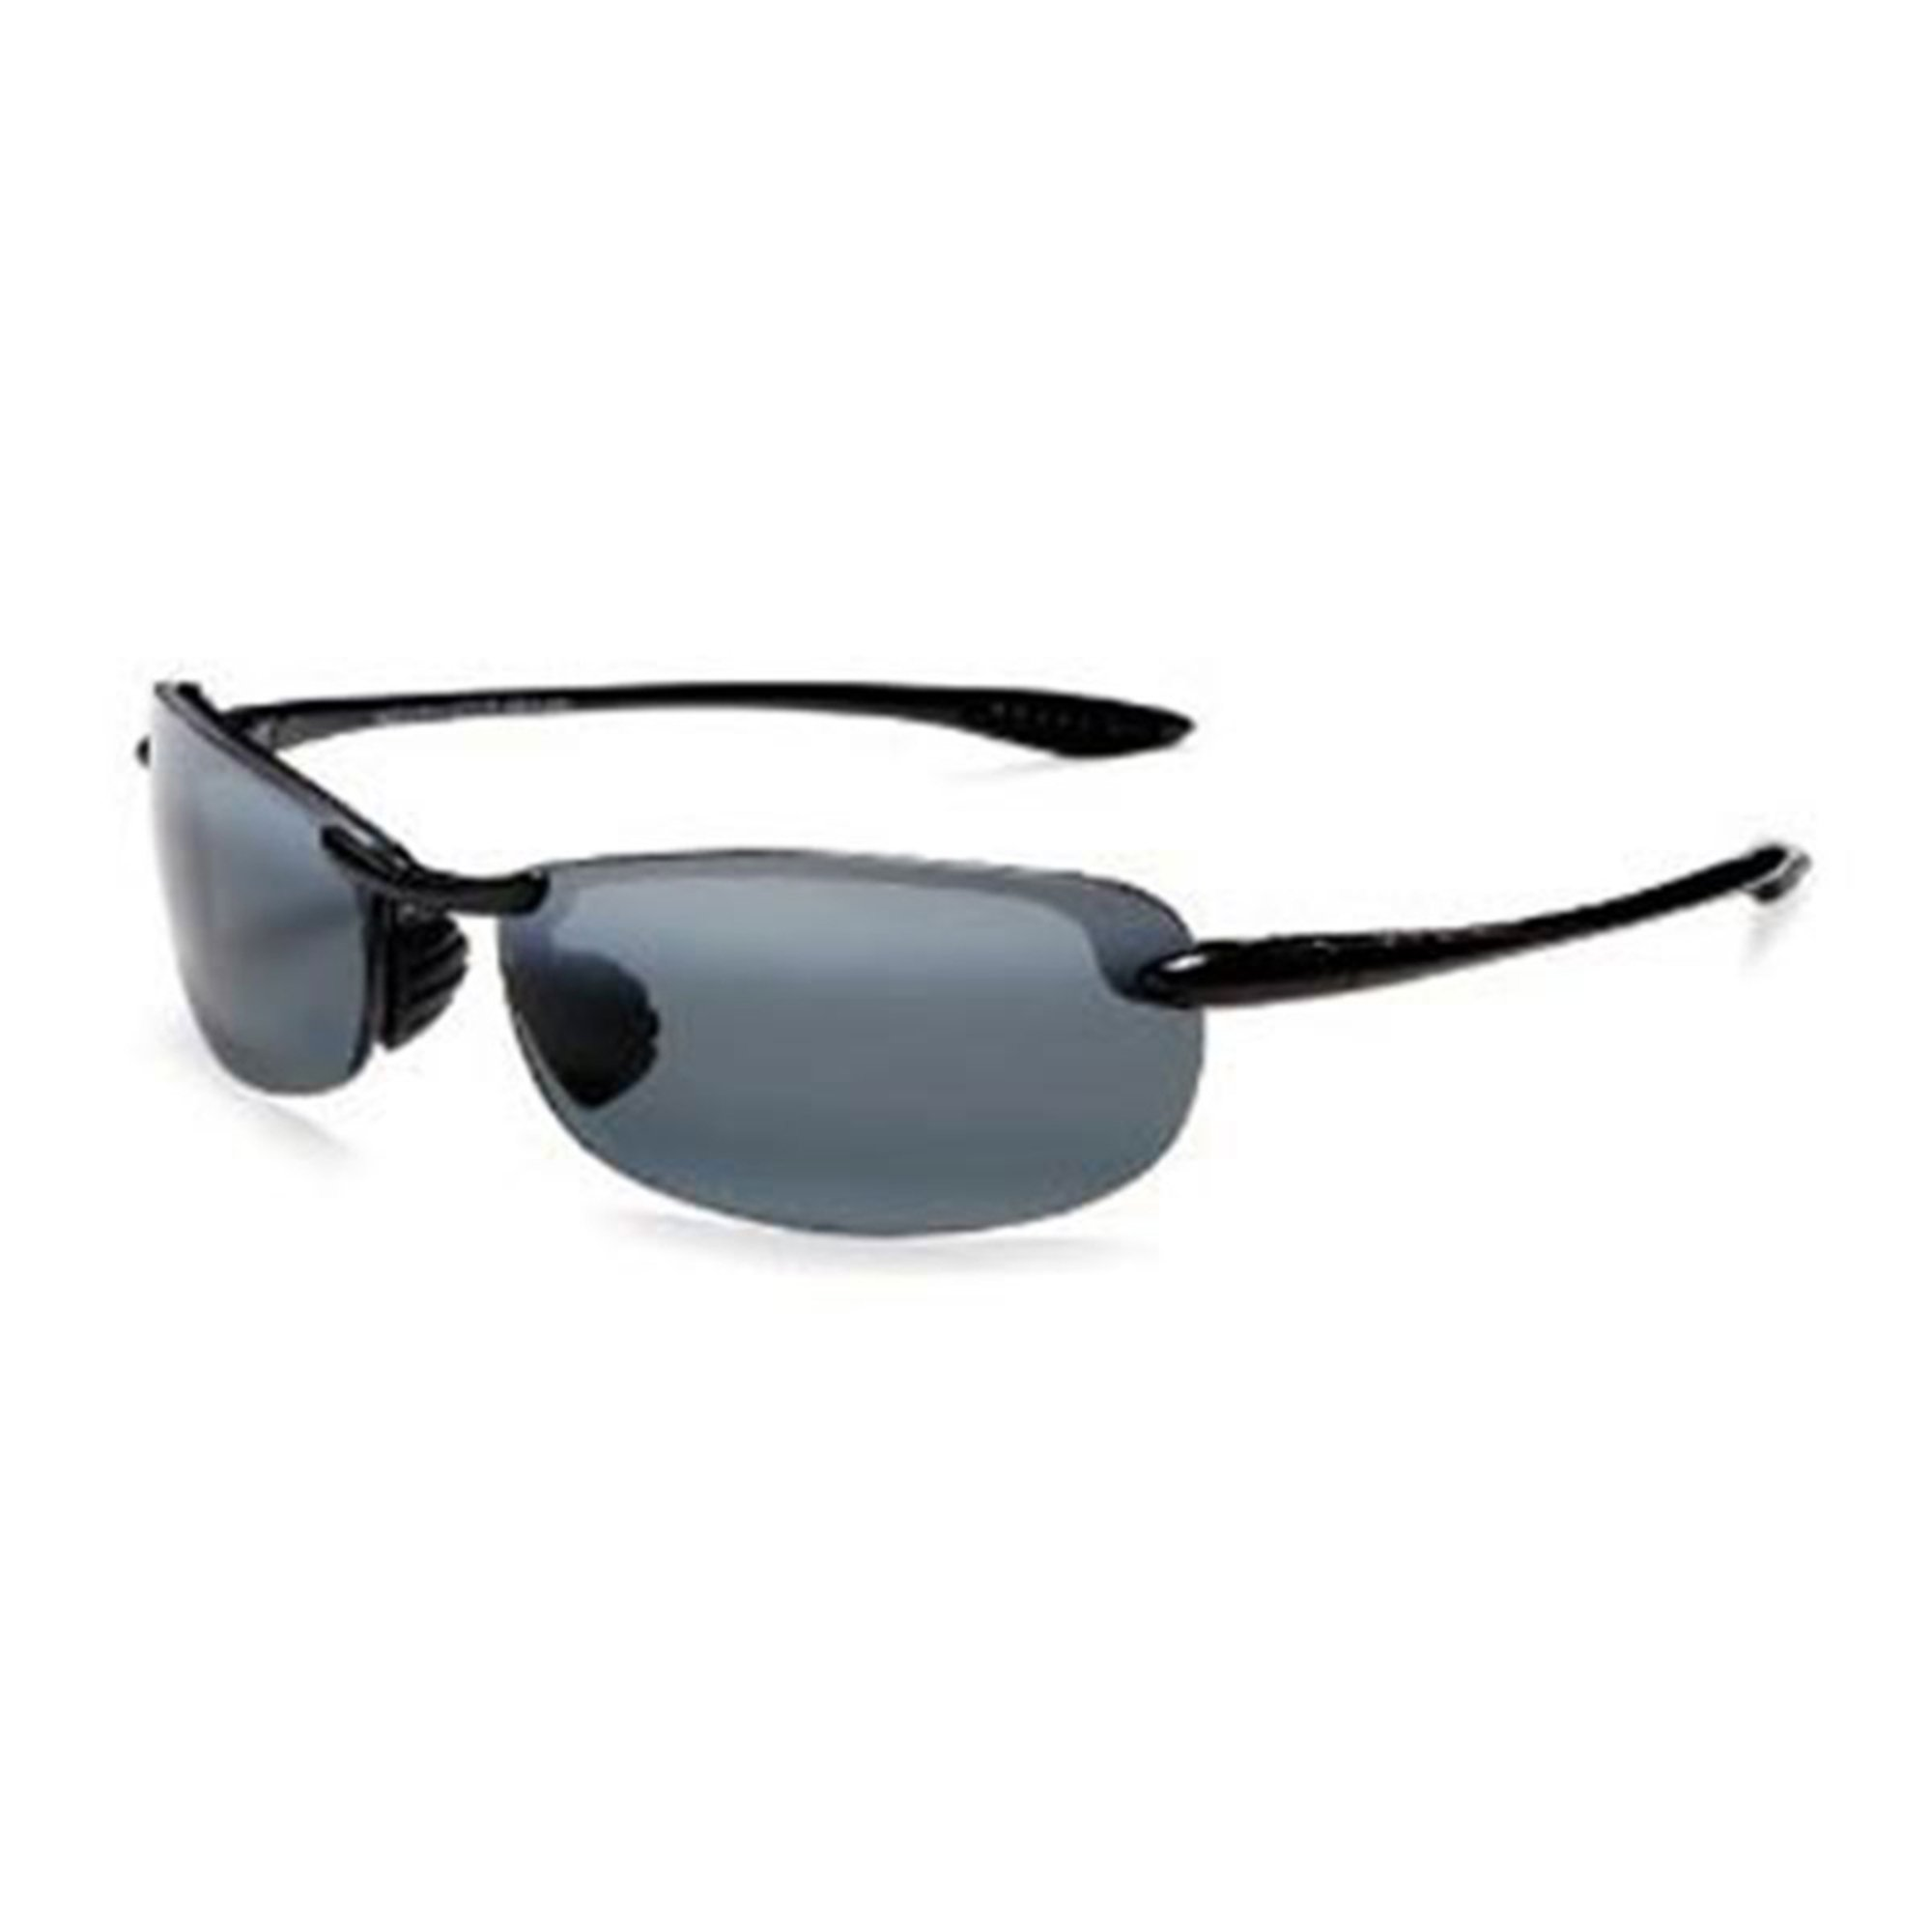 503f79aada32e Maui Jim Women s Polarized Makaha Sunglasses